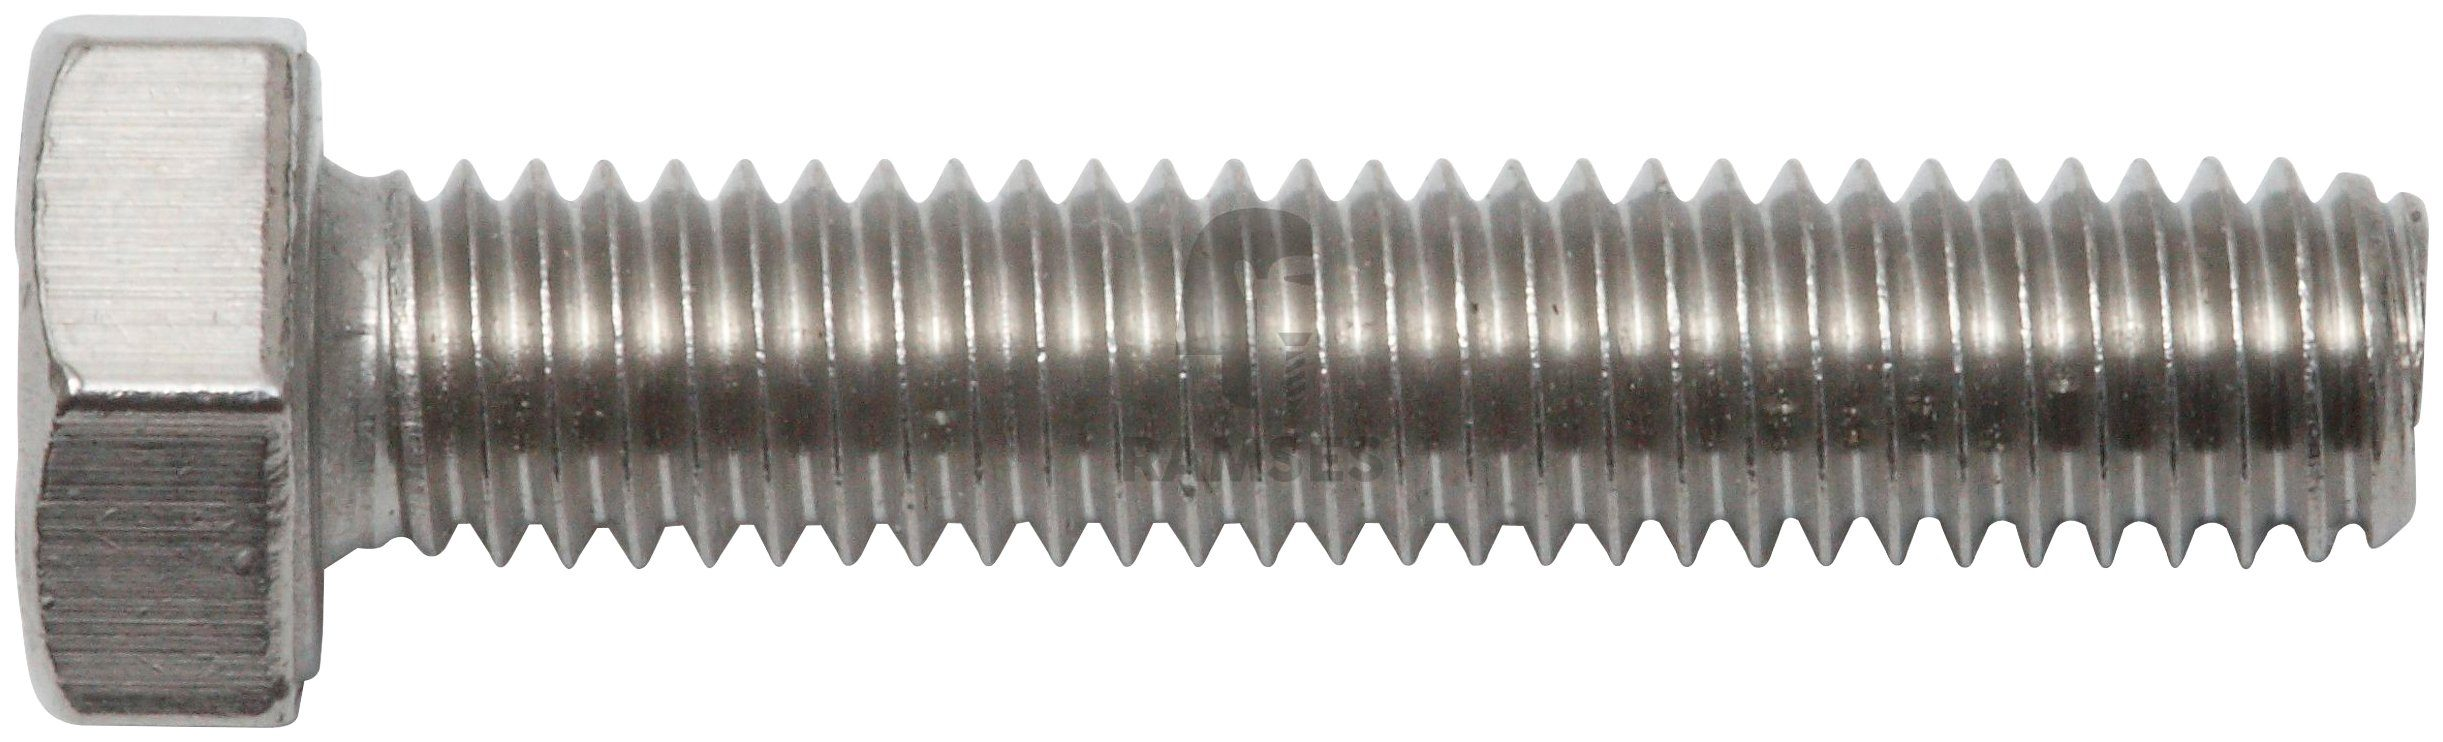 RAMSES Schrauben , Sechskantschraube M12 x 100 mm 10 Stk.